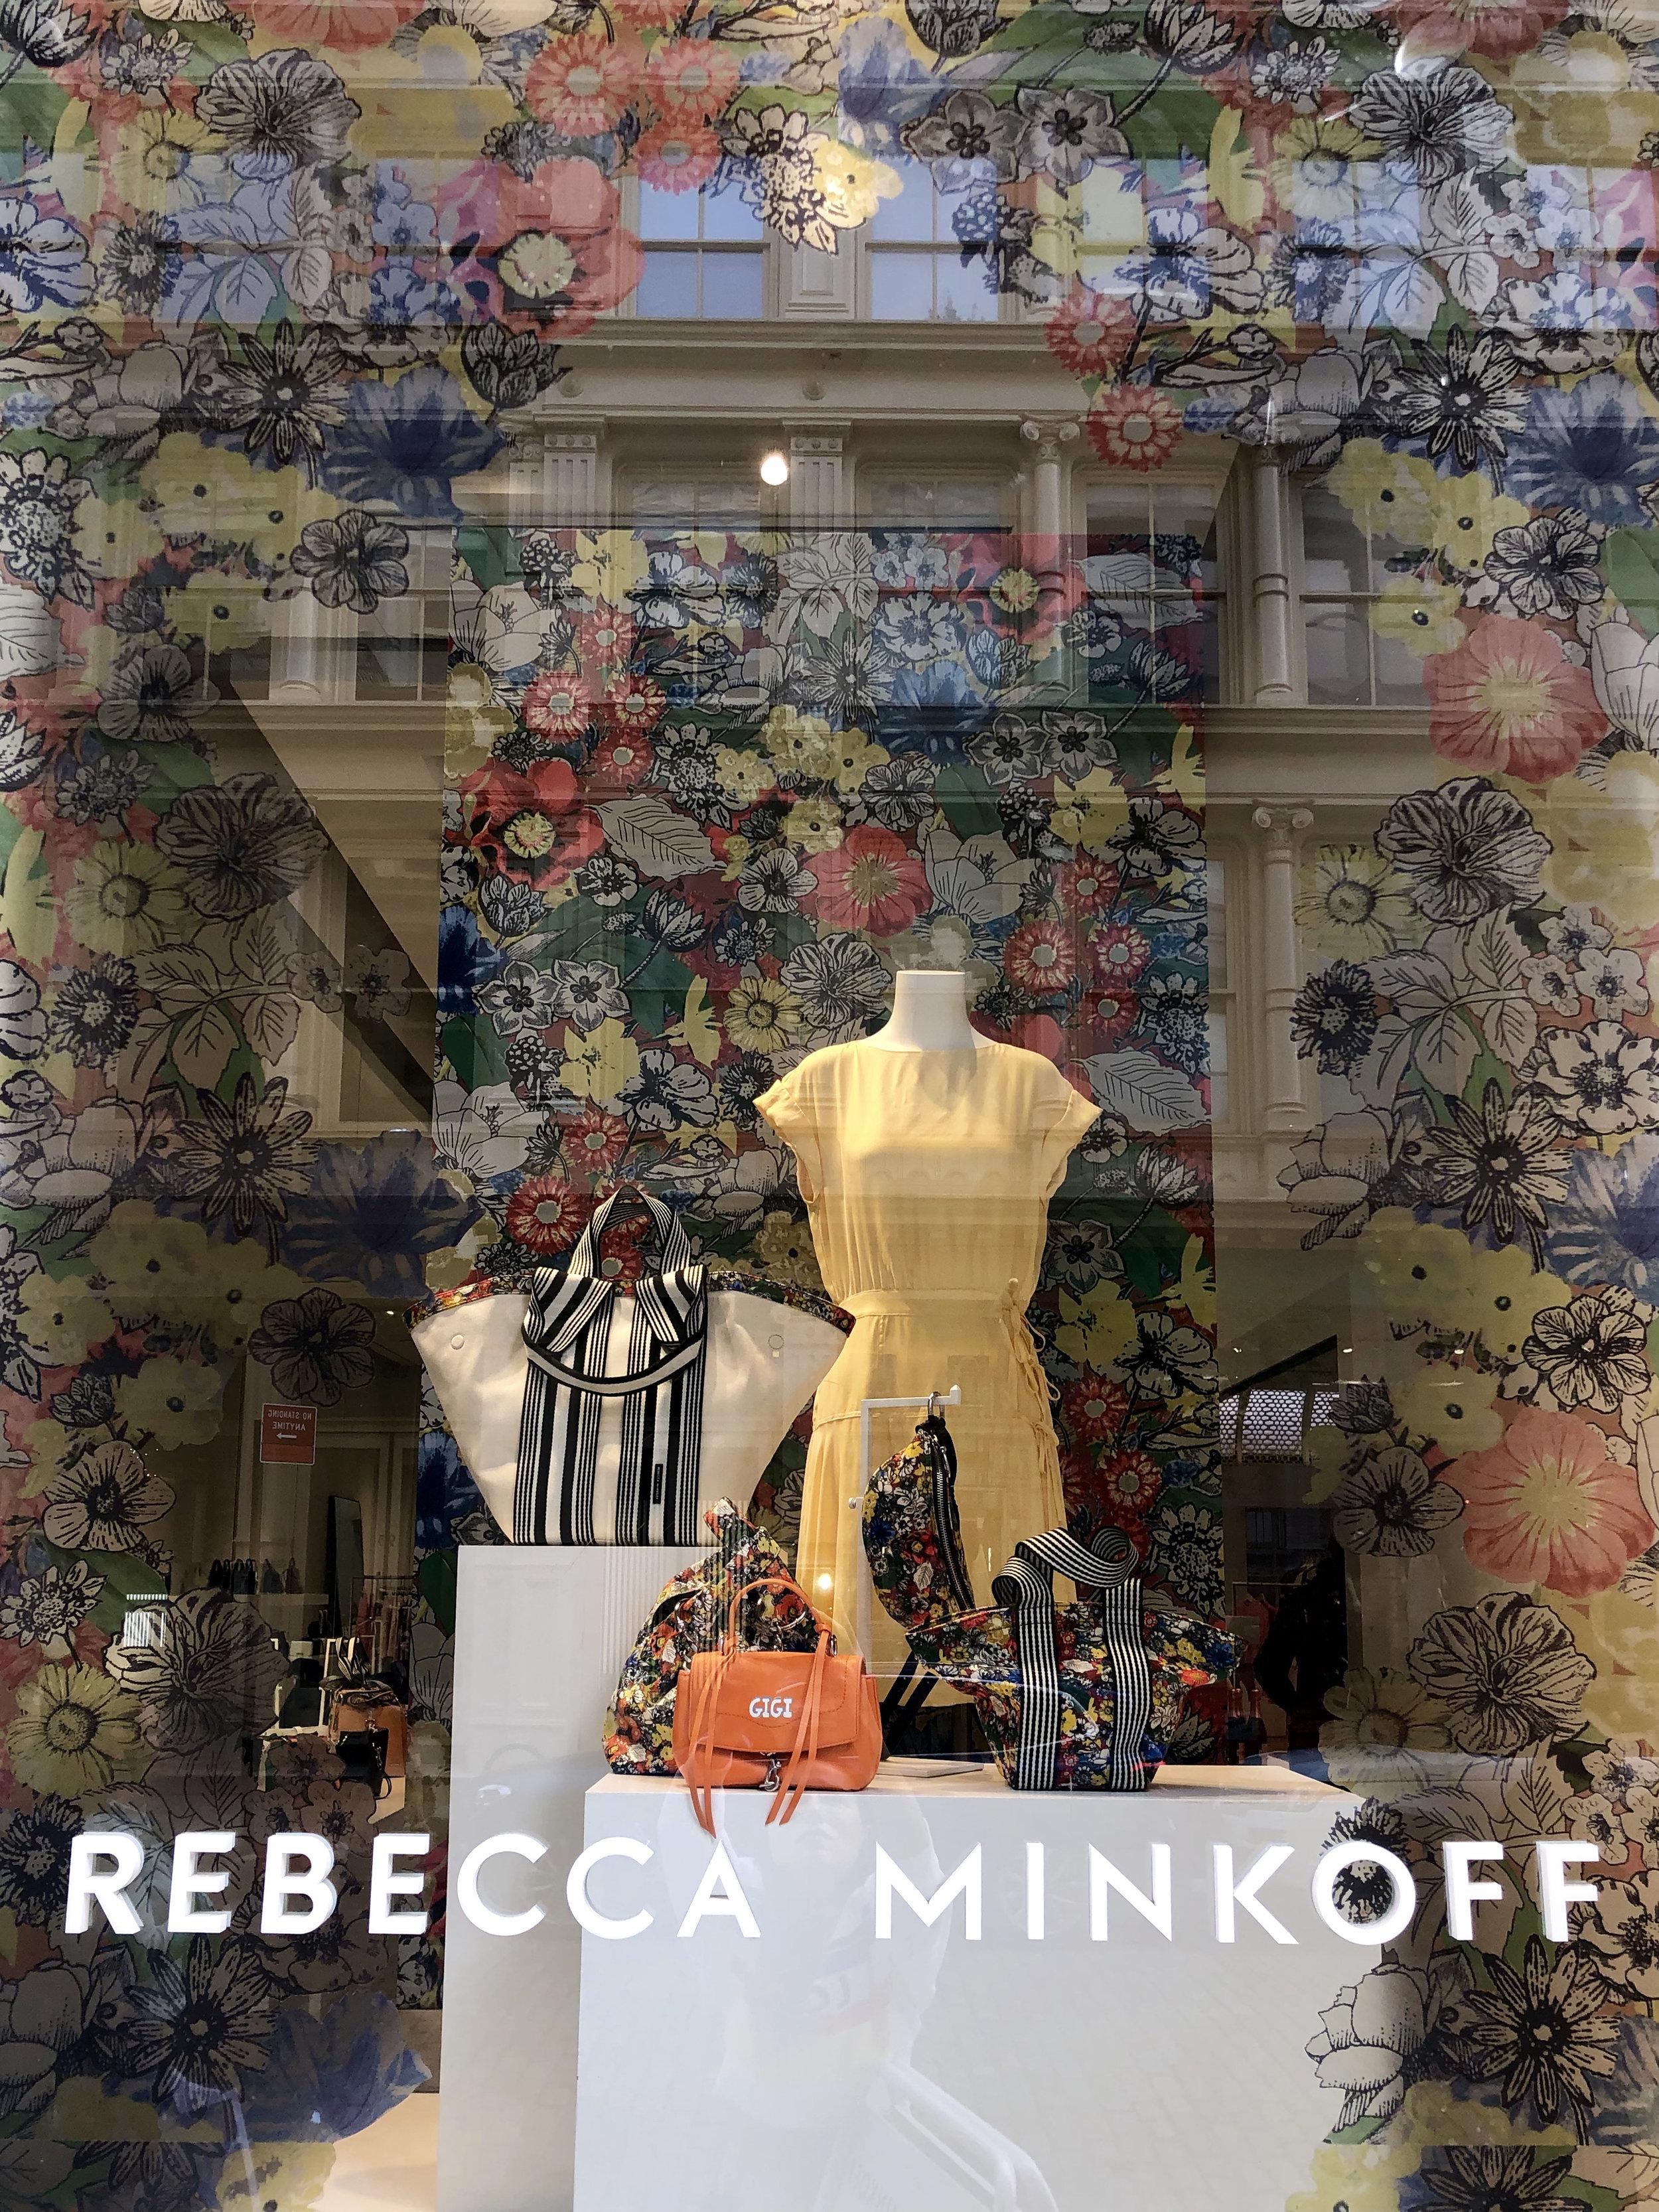 katrina-eugenia-rebecca-minkoff-myrm-rebecca-minkoff-bag-live-painting-live-painter-live-art-live-artist-nyc-greene-street-soho-new-york-city-nyc38.jpg